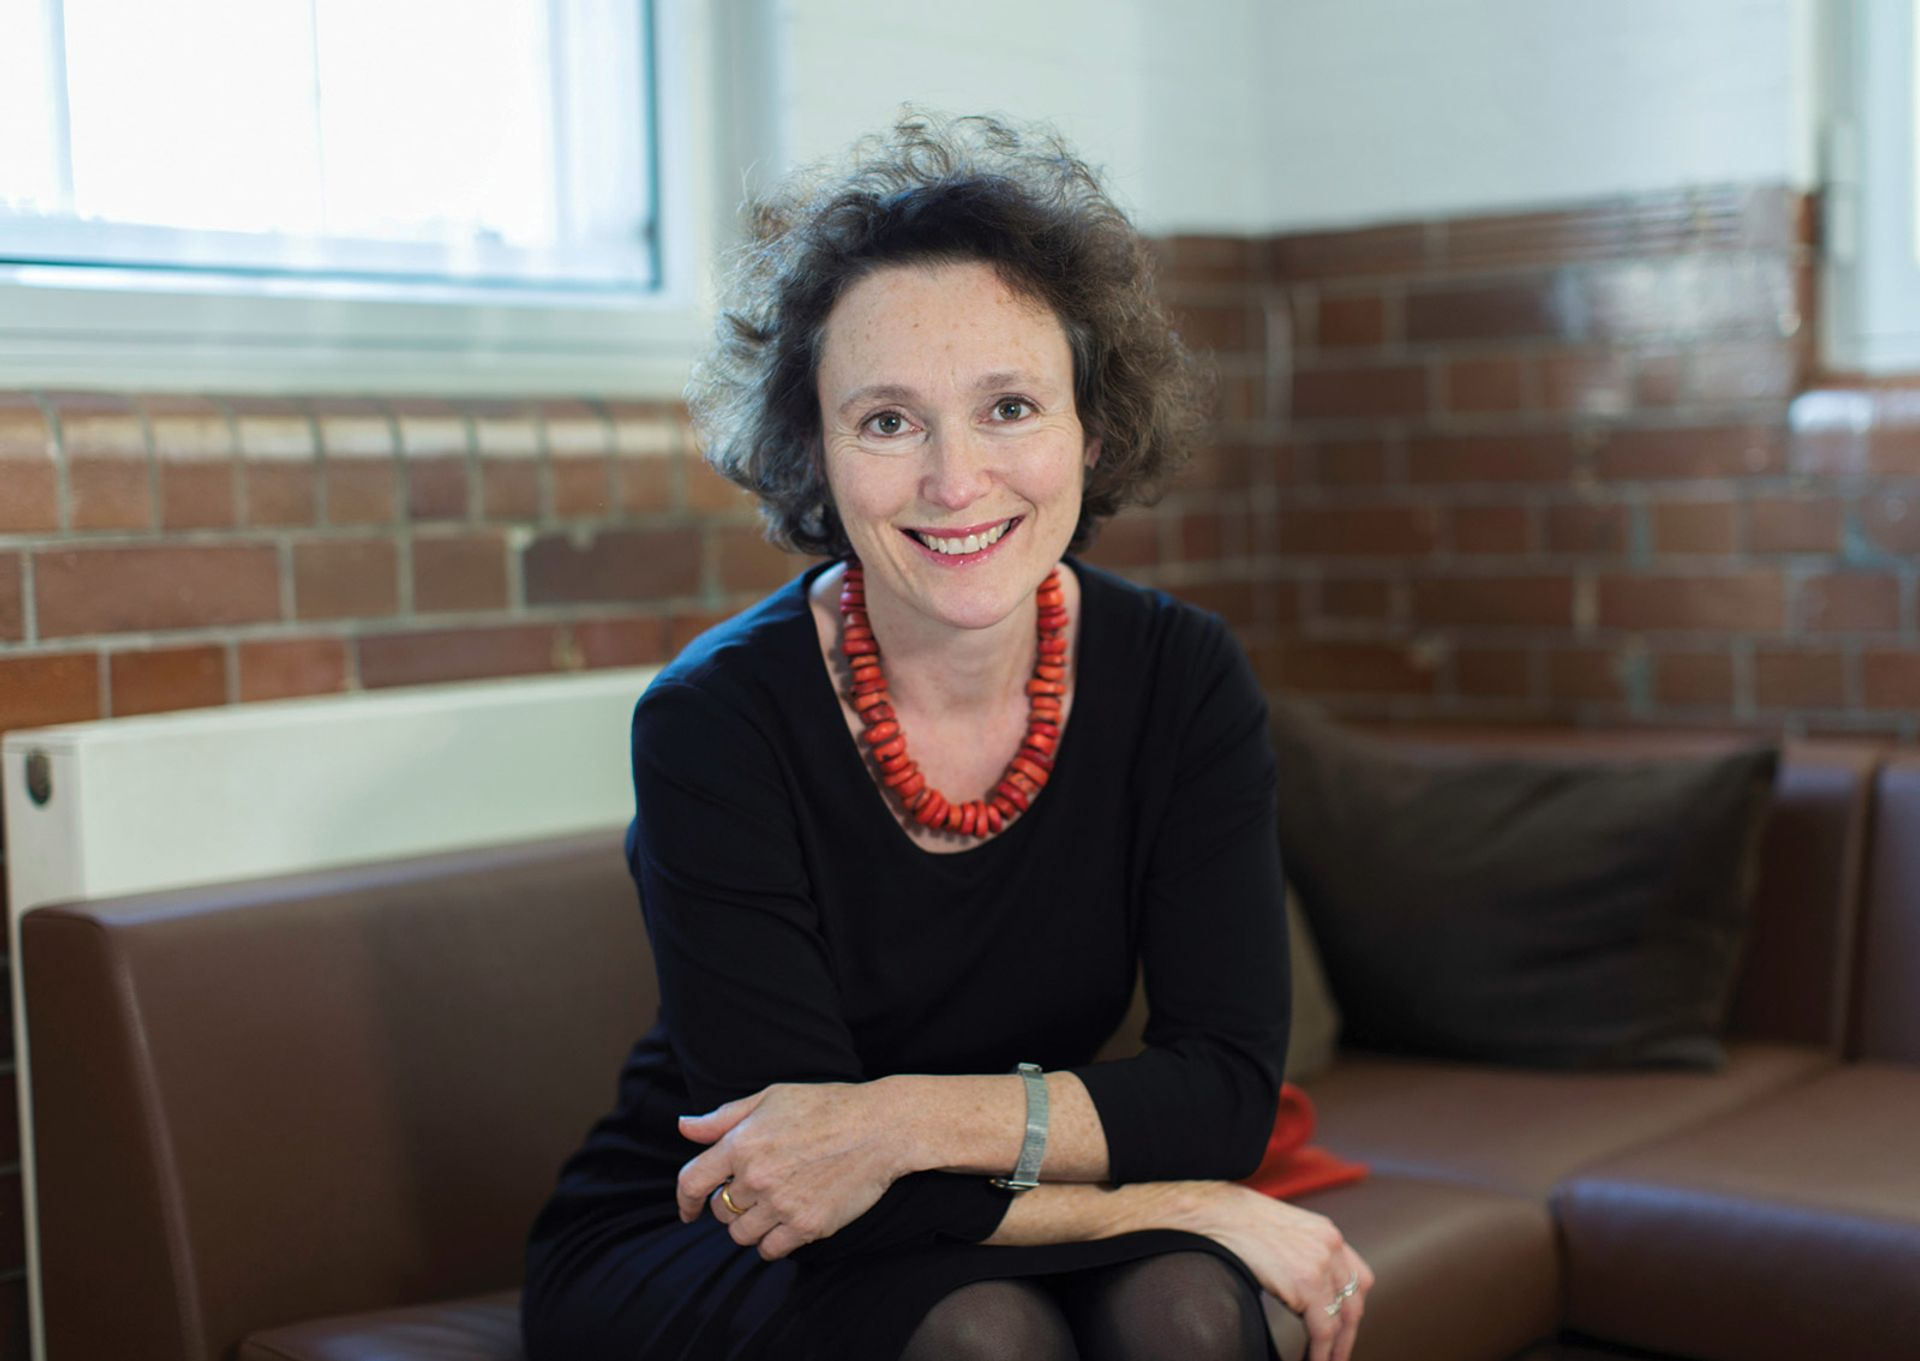 Jenny Waldman, director of Art Fund UK © Pari Naderi